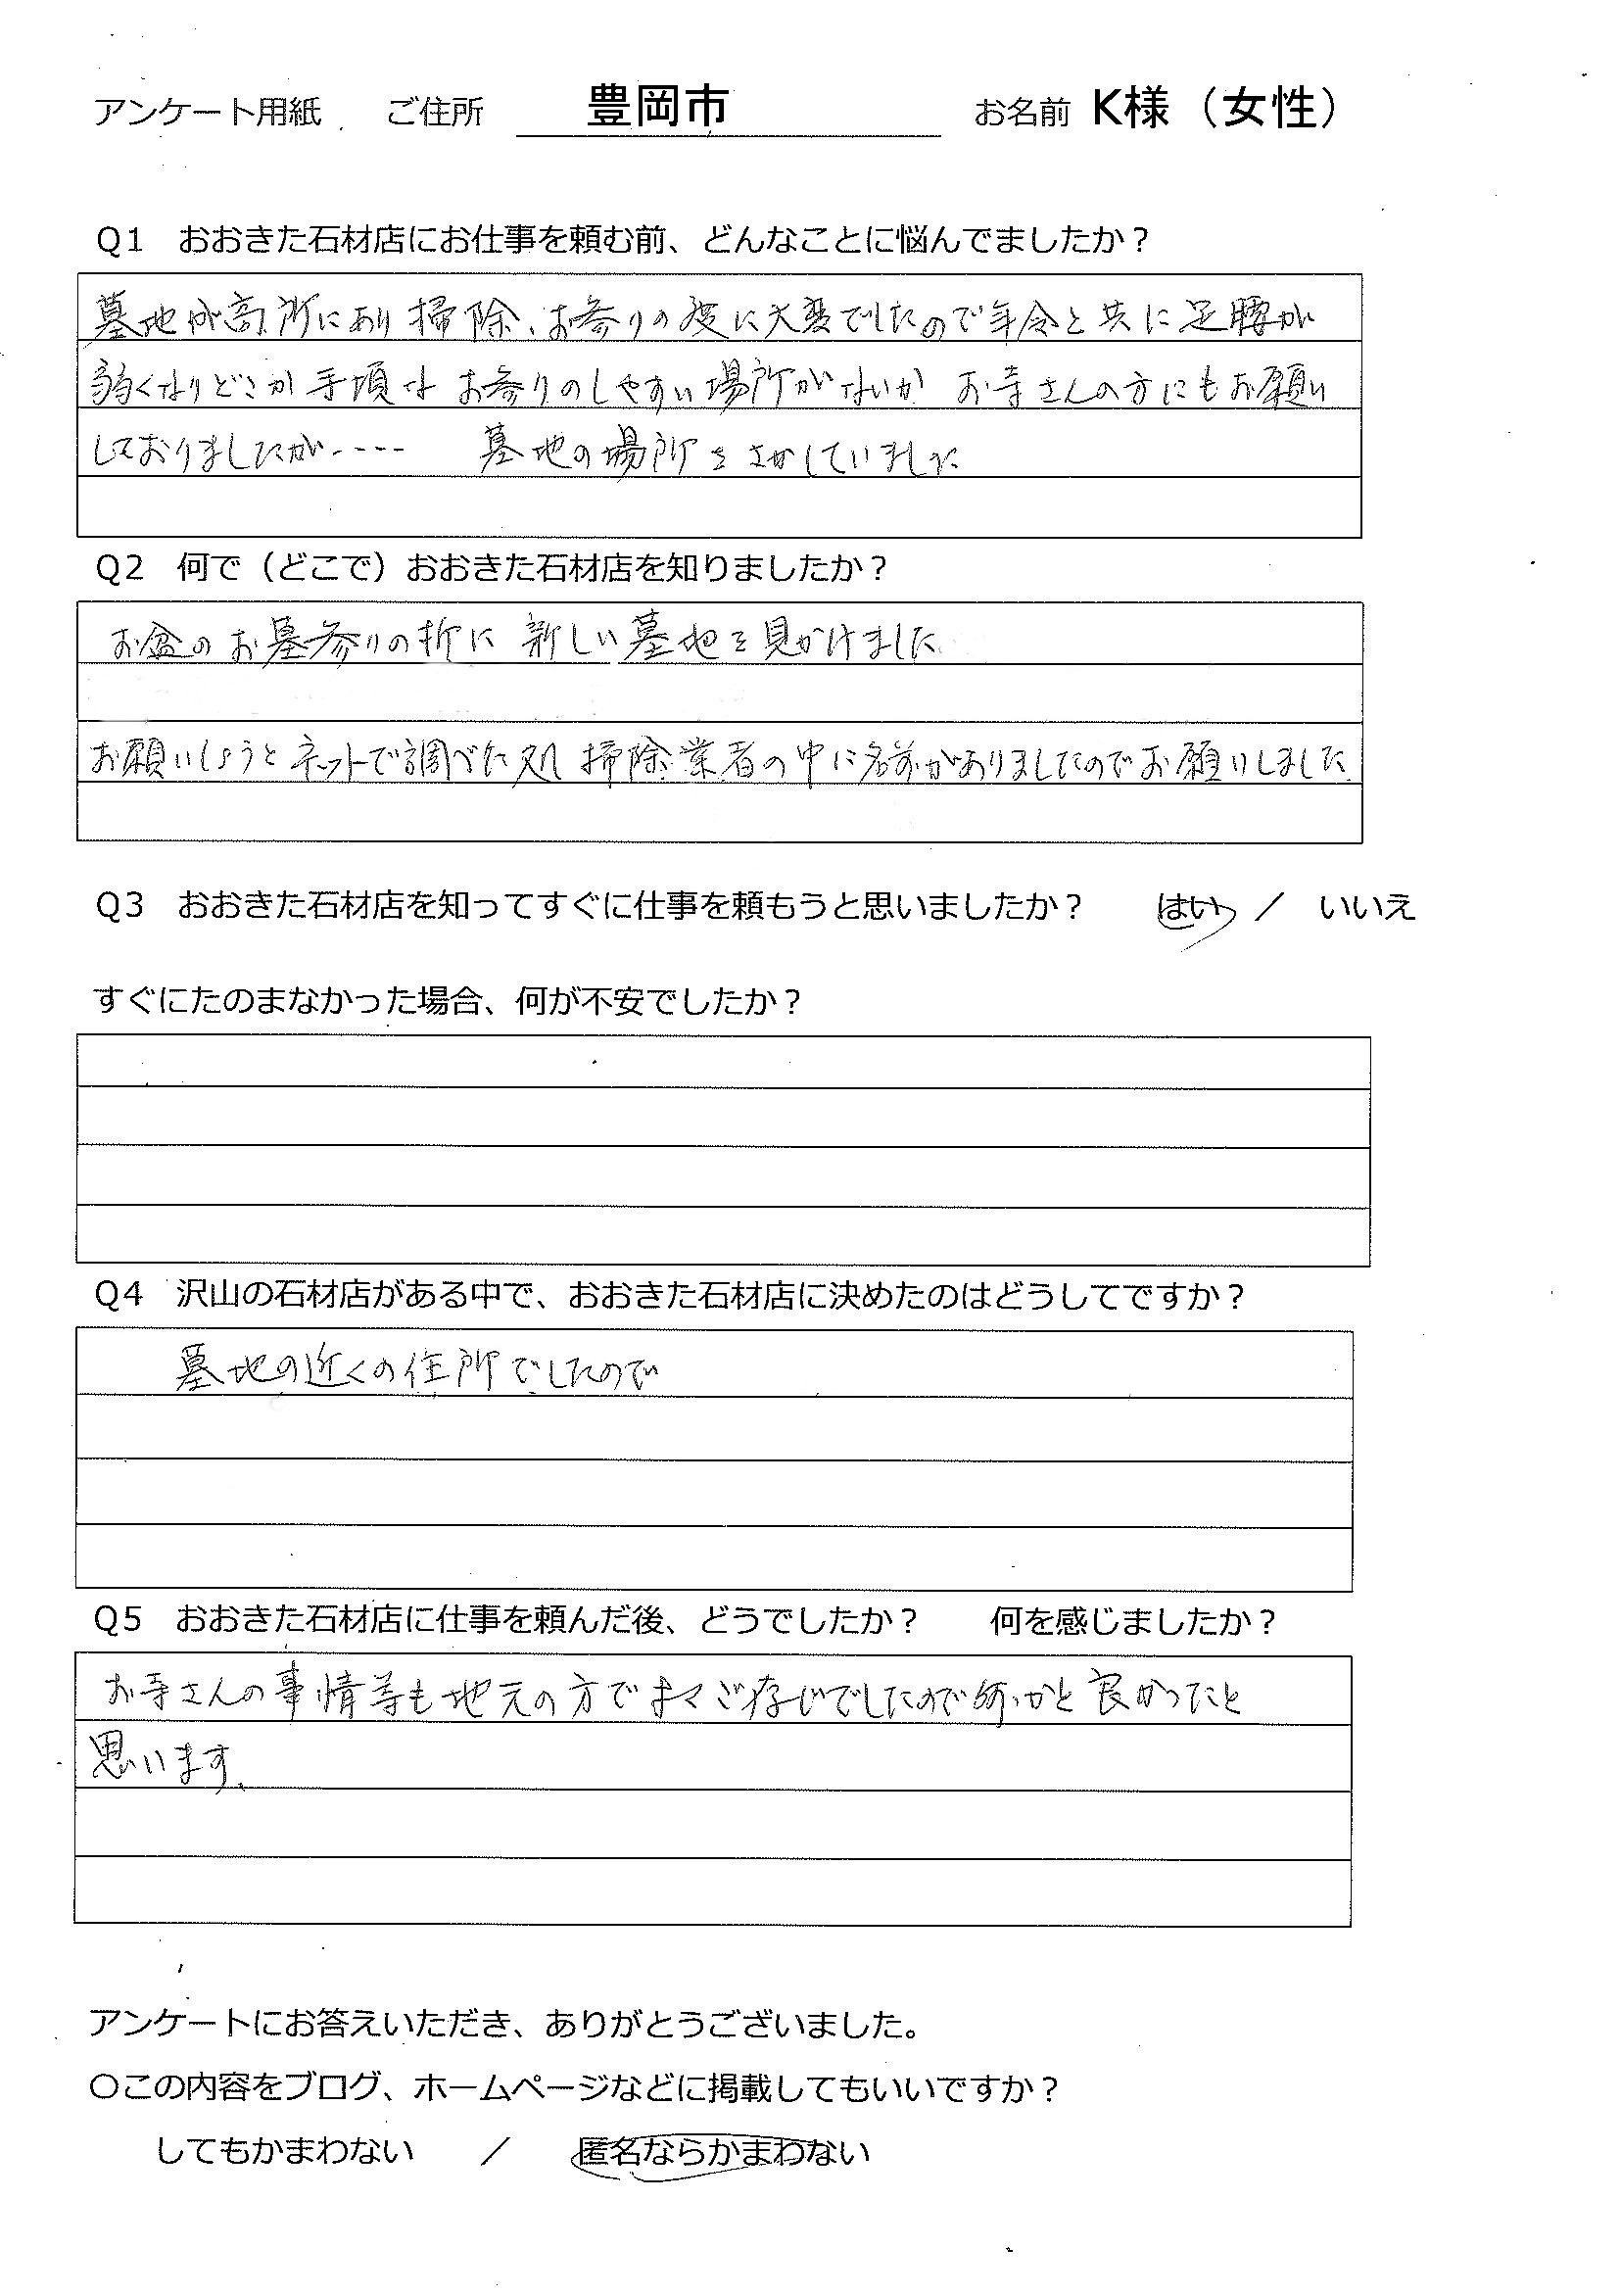 2018-03-11小崎様お客様の声(改)